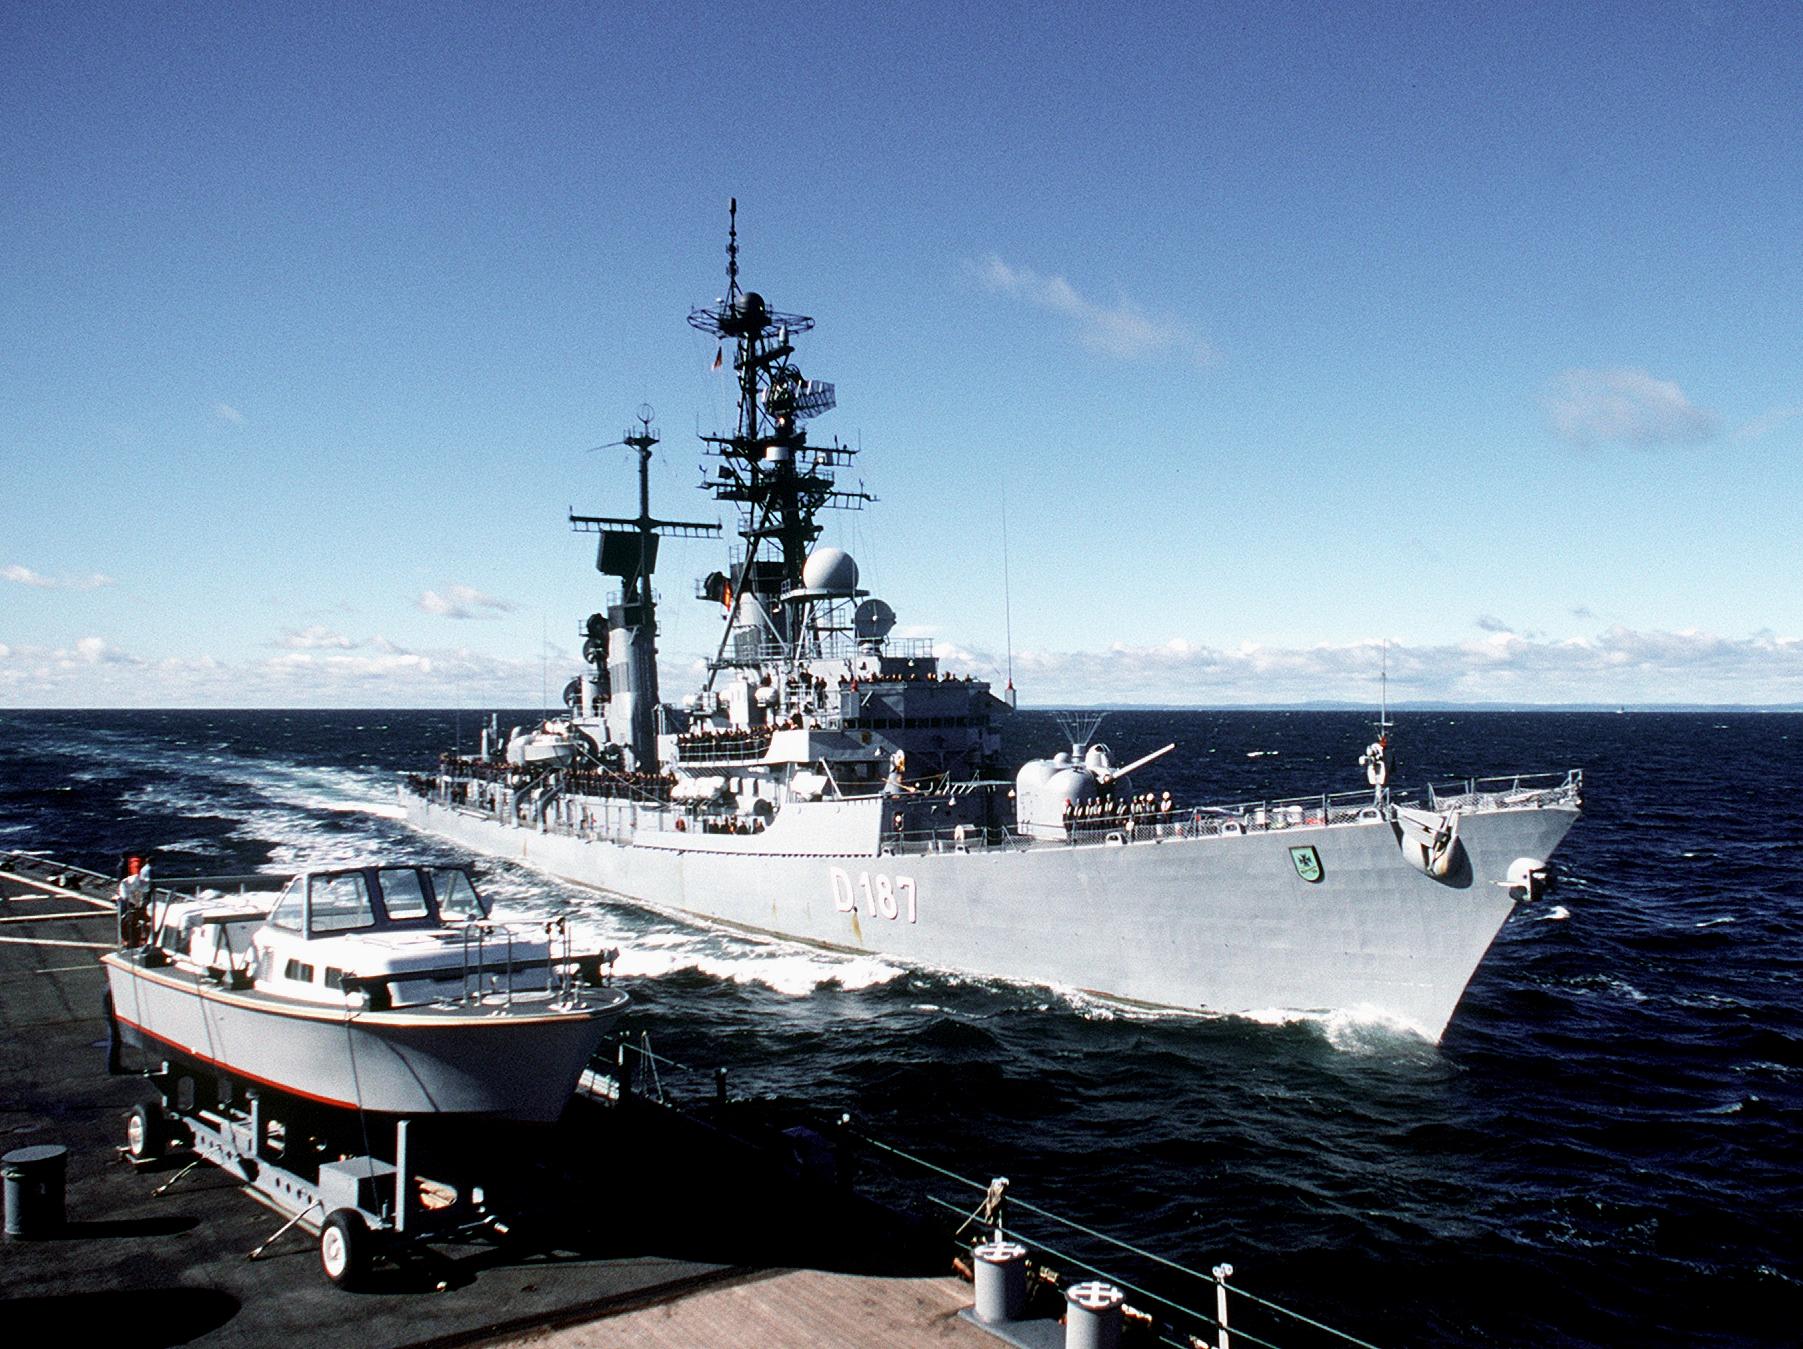 German_destroyer_Rommel_(D_187)_passing_USS_Iowa_(BB-61)_in_the_Atlantic_Ocean_on_1_September_...jpg